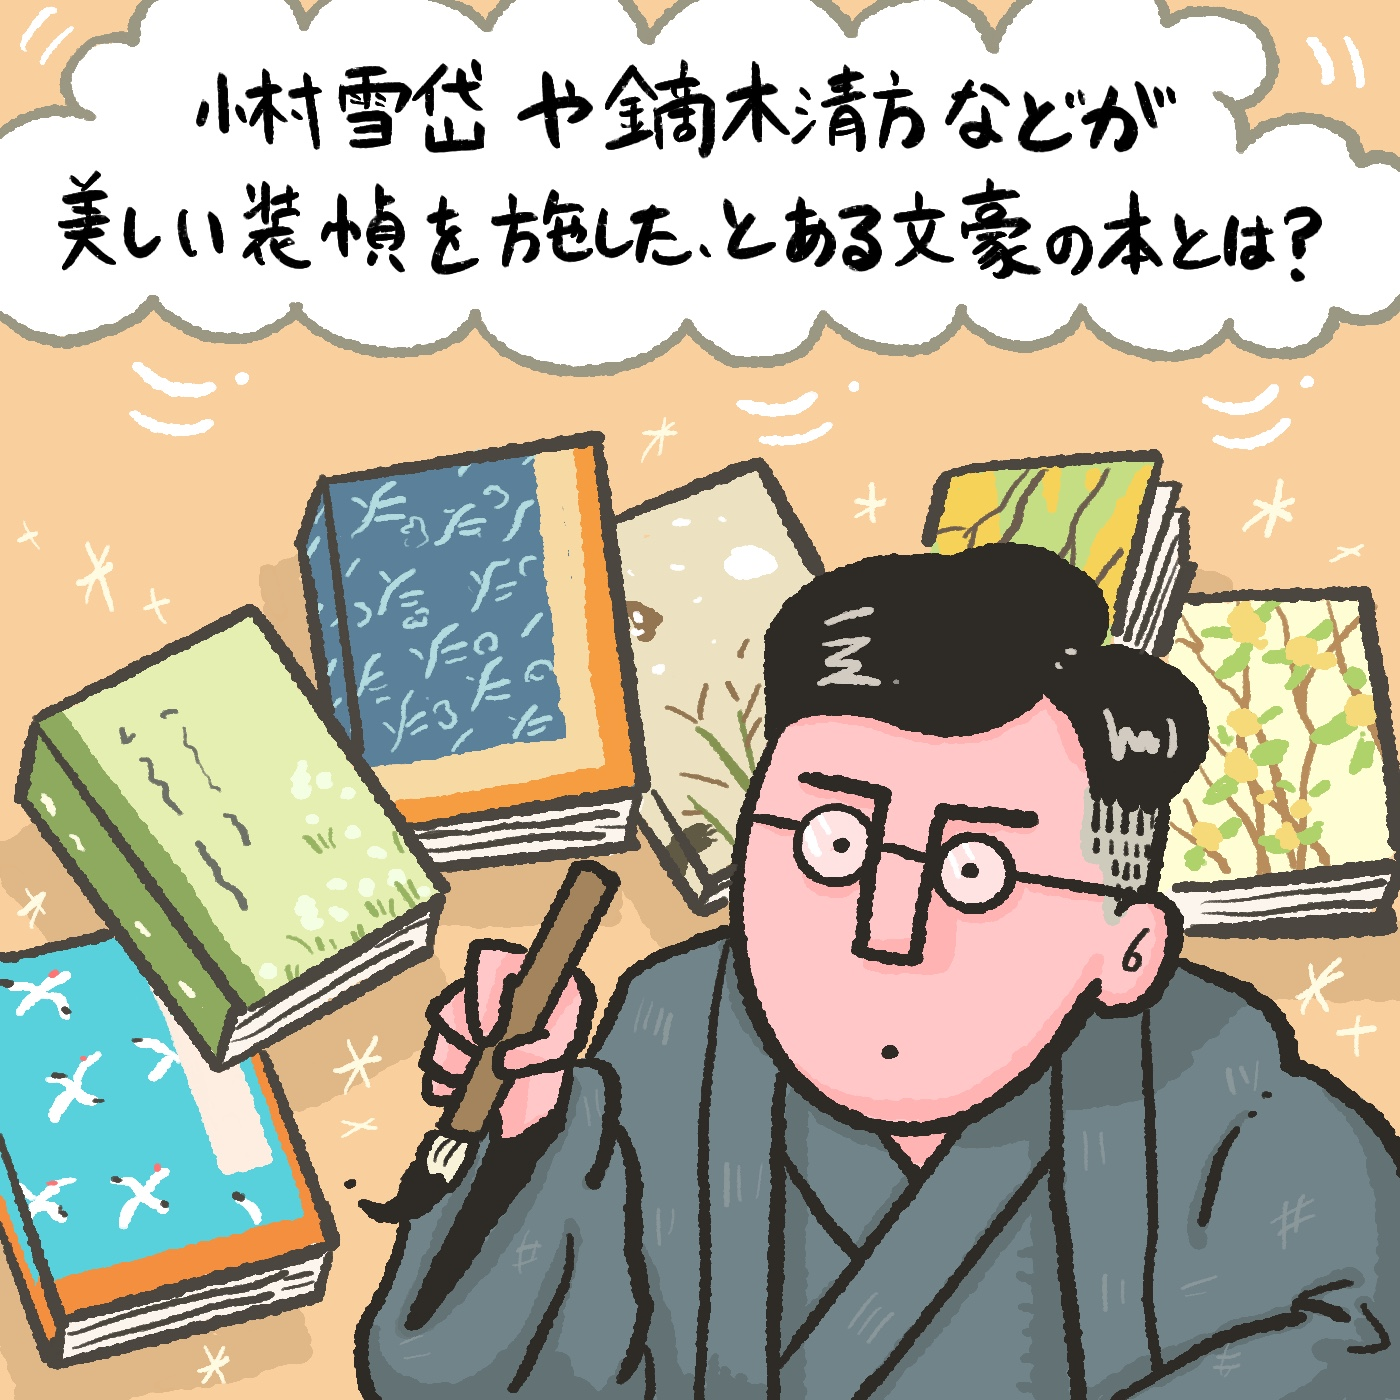 OBIKAKE ナニソレ 泉鏡花 藤野遼太